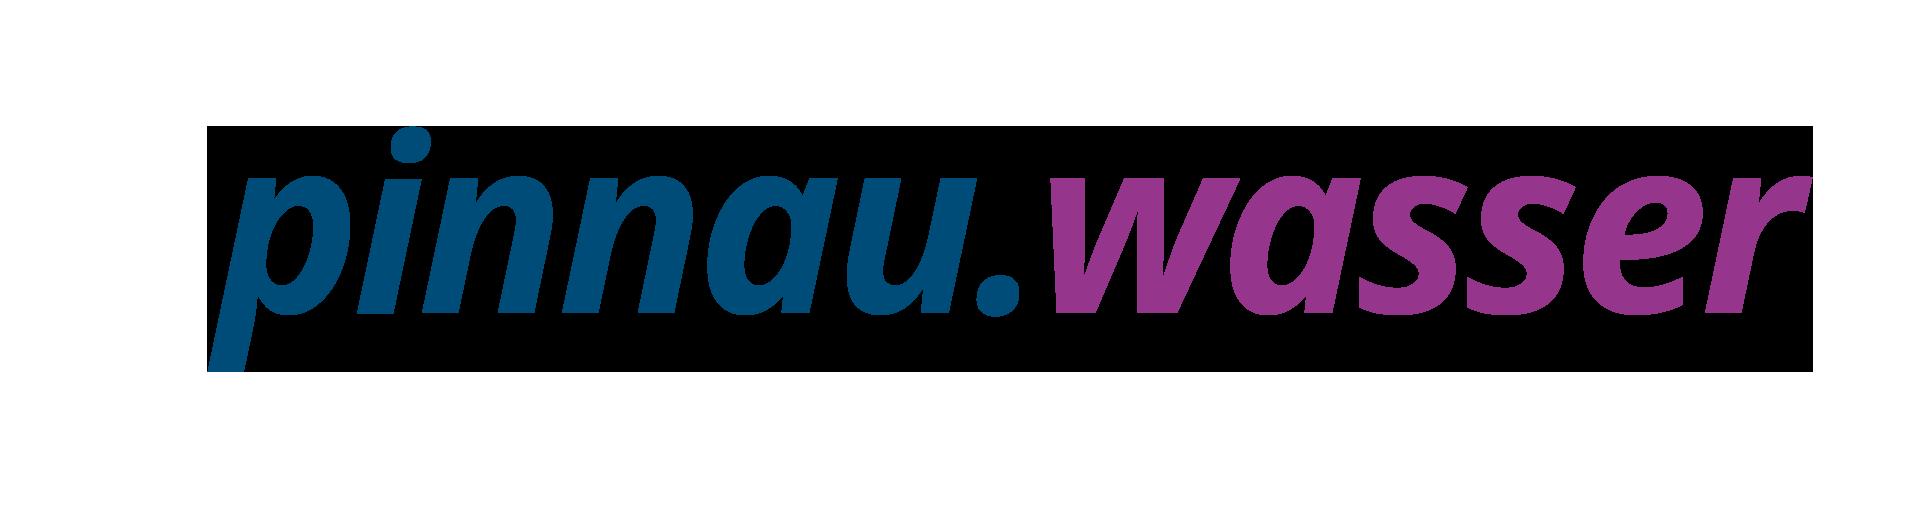 pinnau-wasser